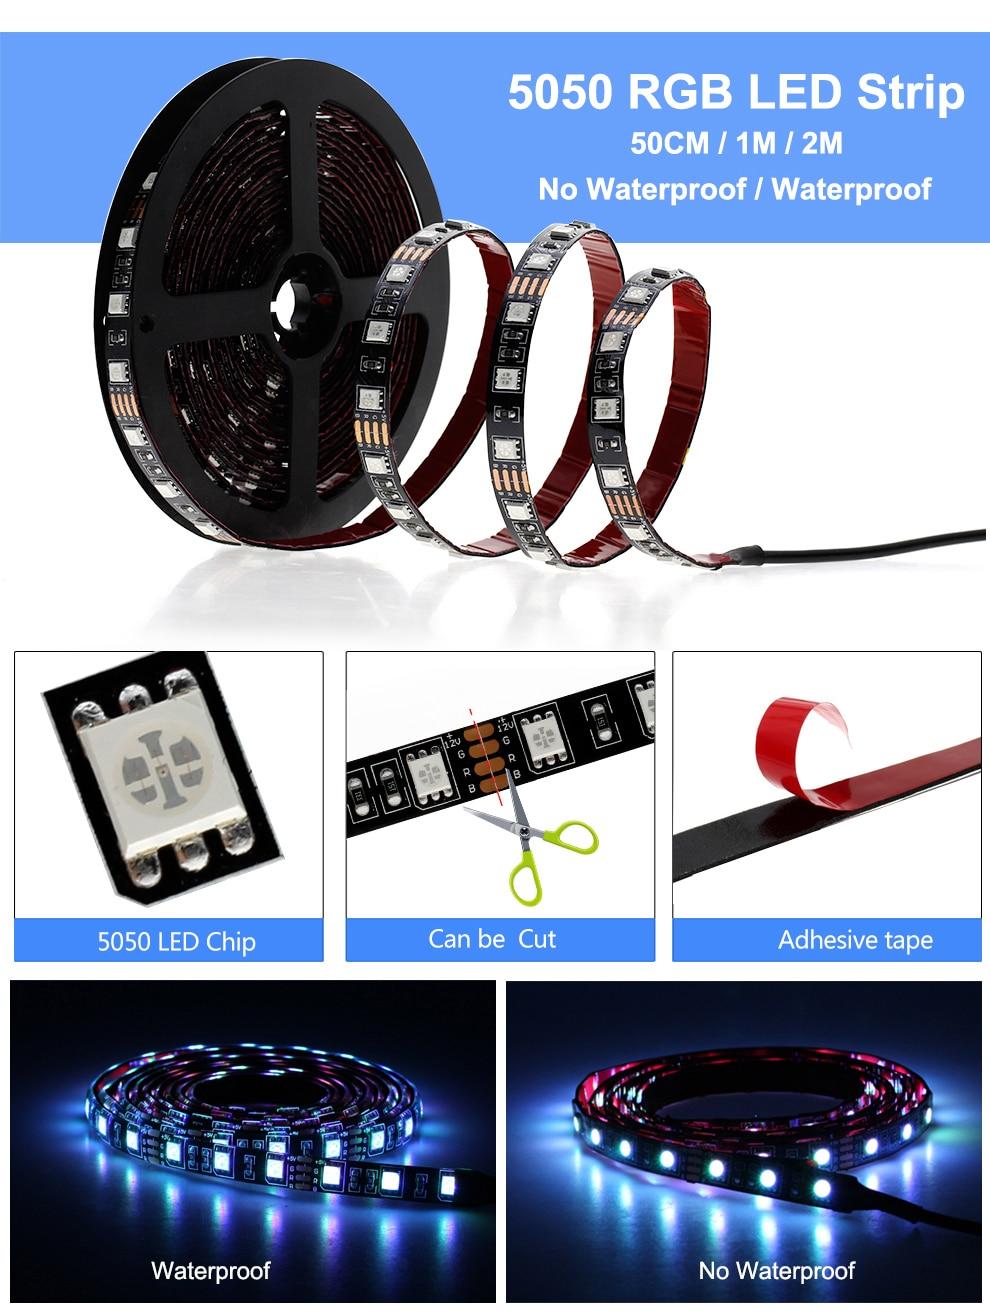 HTB1bc6tO3HqK1RjSZJnq6zNLpXaR USB LED Strip 5050 RGB Changeable LED TV Background Lighting 50CM 1M 2M 3M 4M 5M DIY Flexible LED Light.